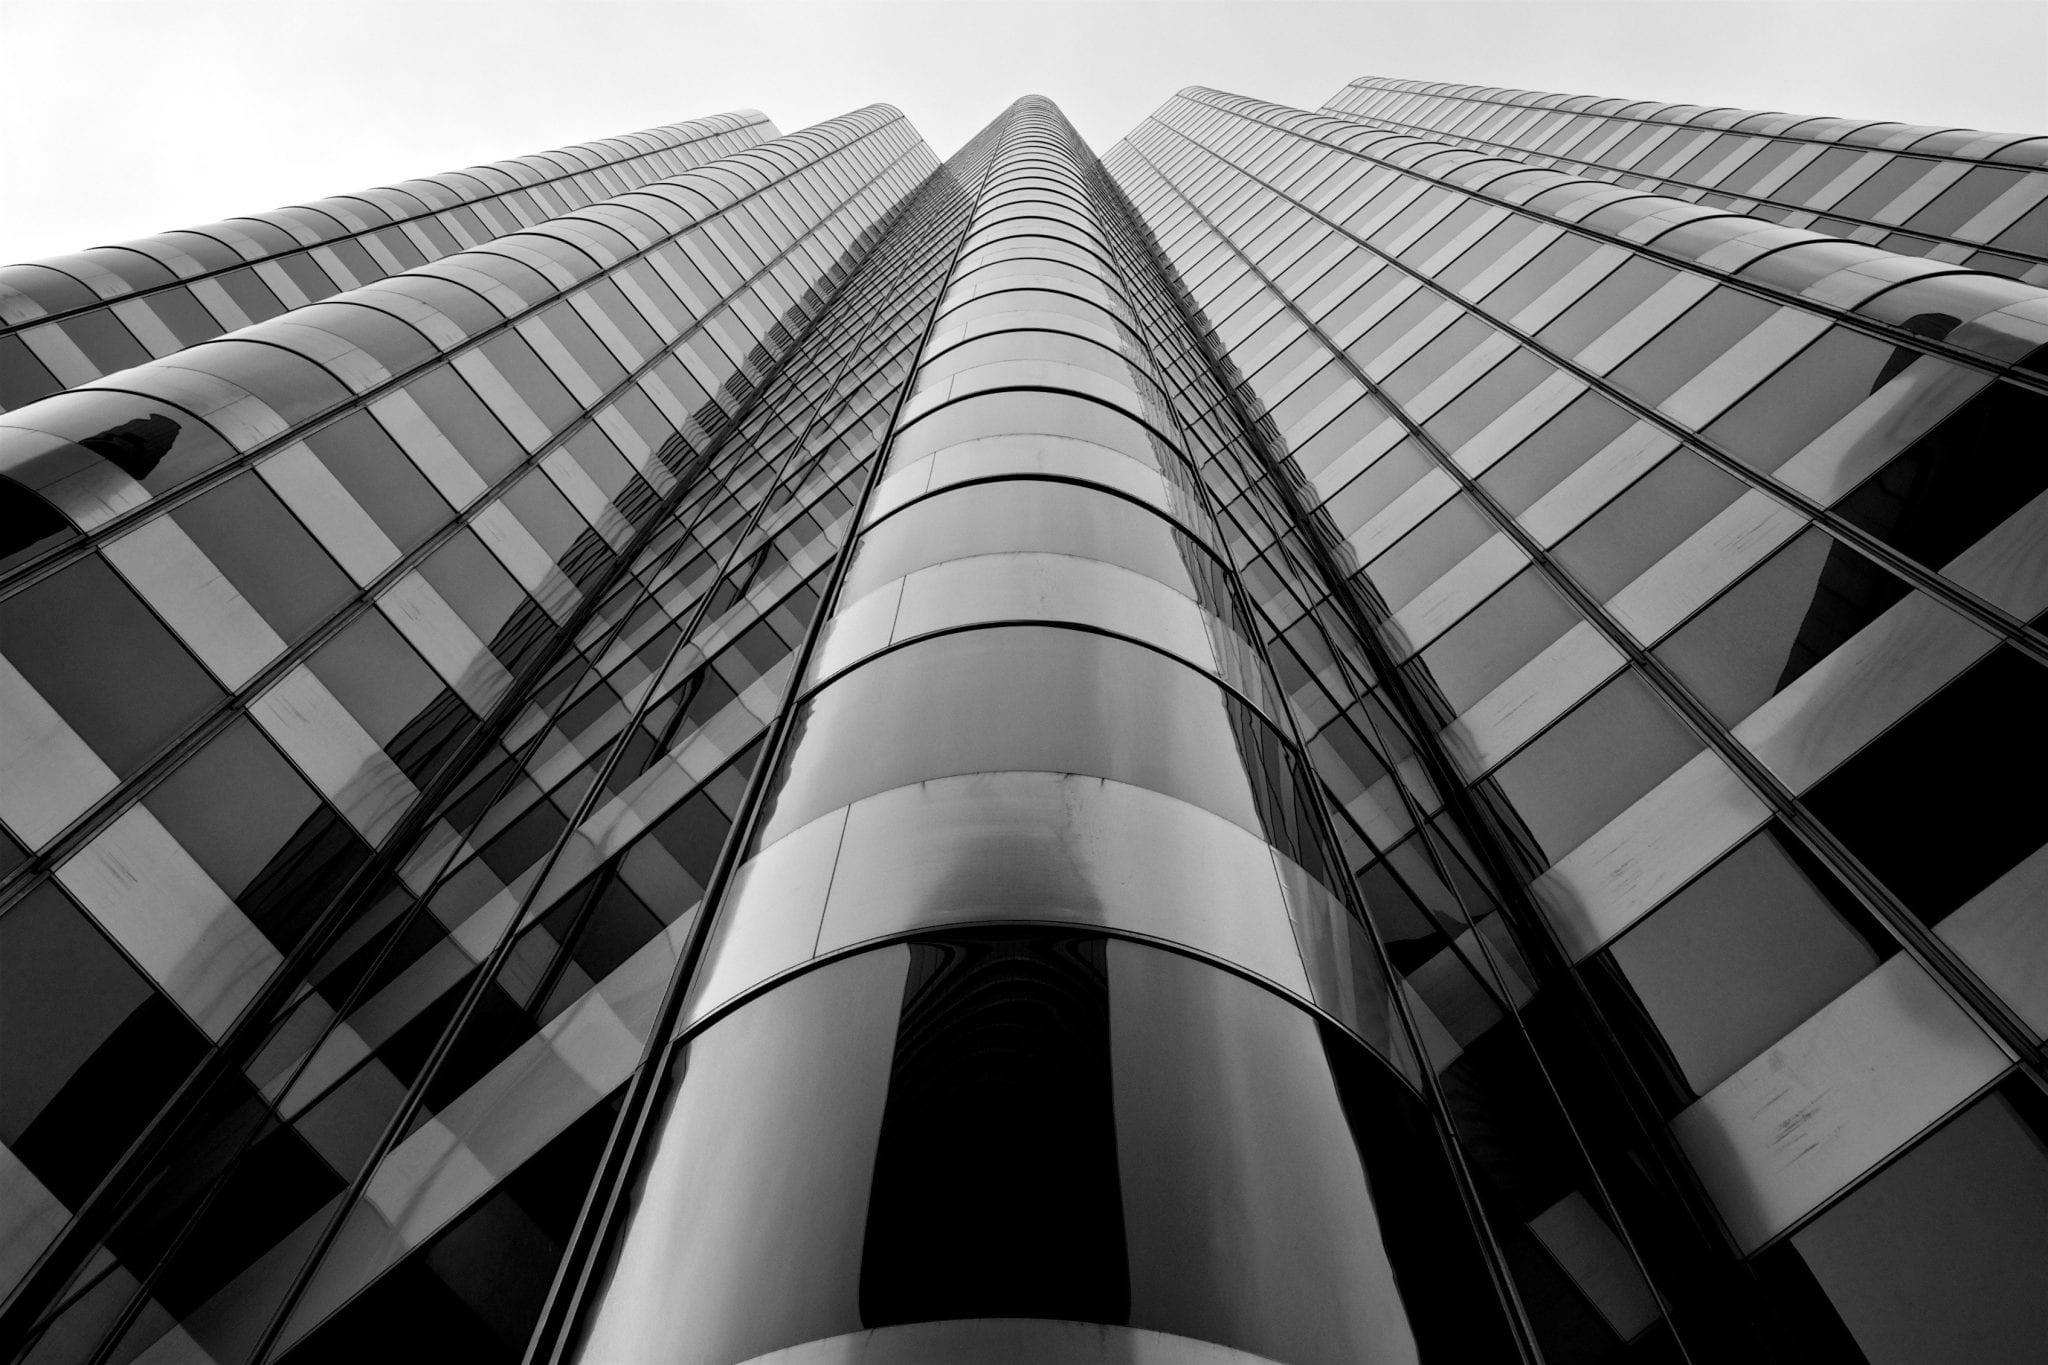 architecture-black-and-white-building-187913